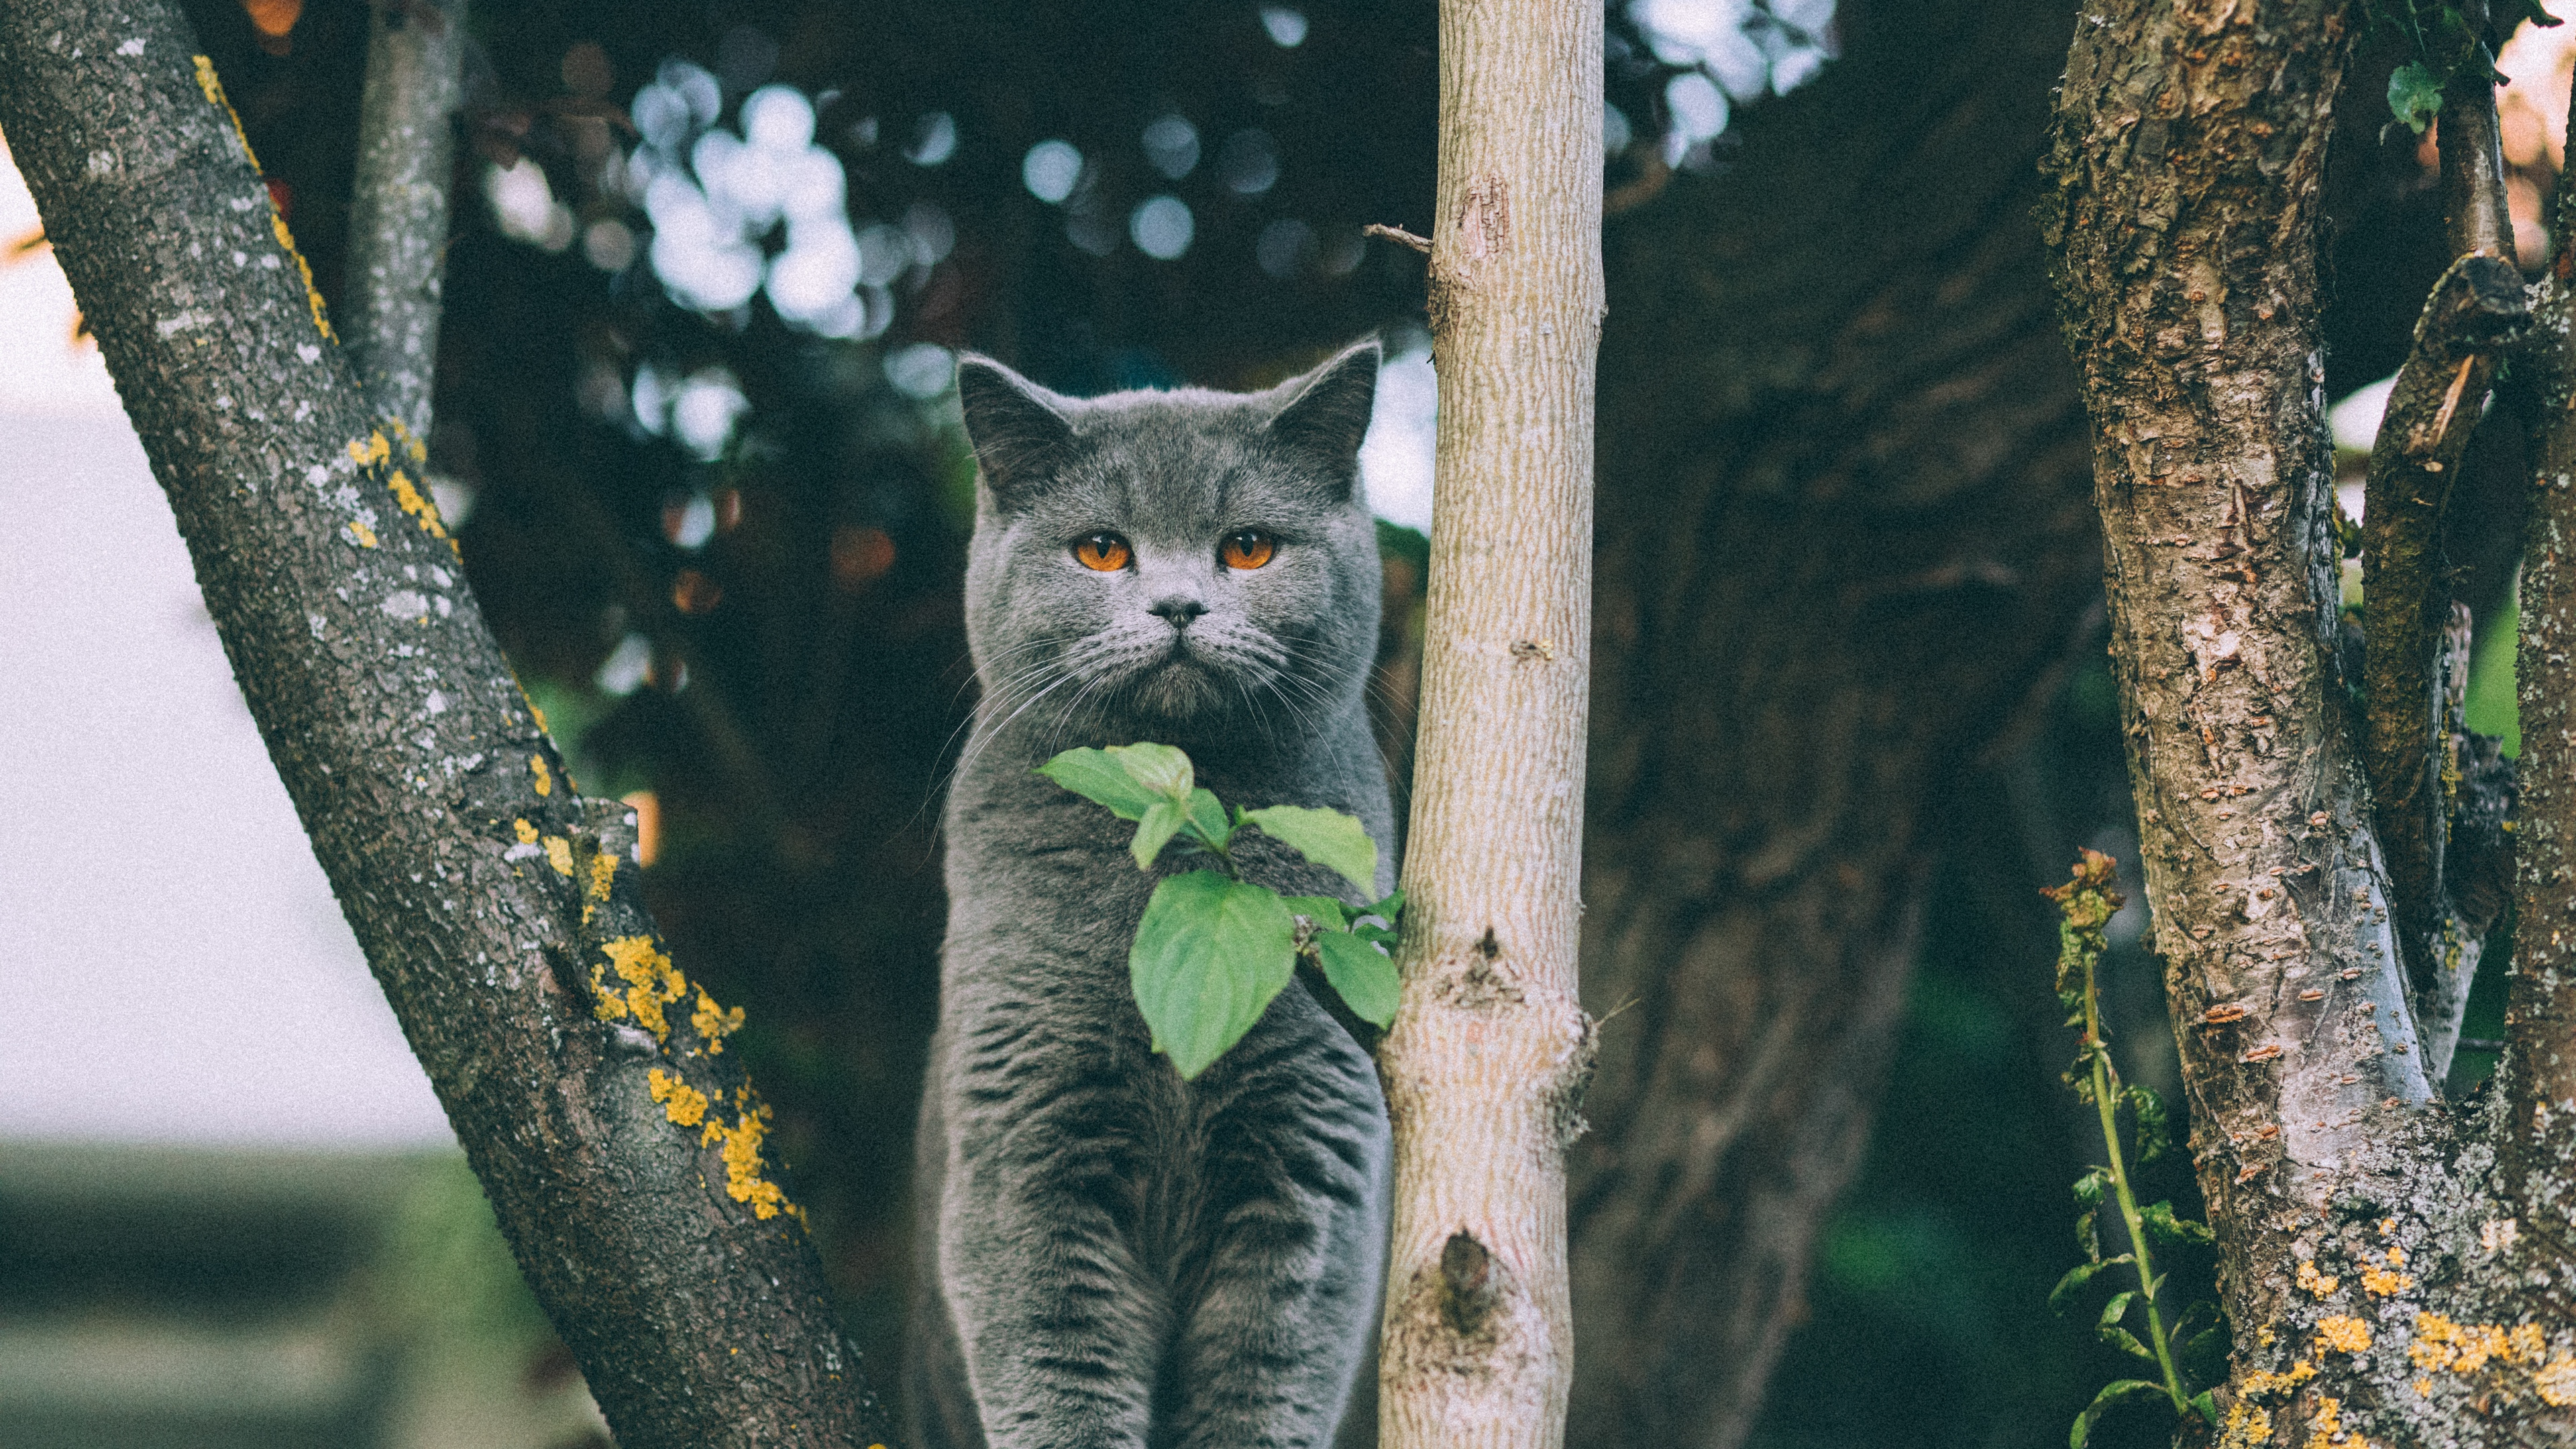 kitten british cat leaves 4k 1542242014 - kitten, british, cat, leaves 4k - Kitten, Cat, British